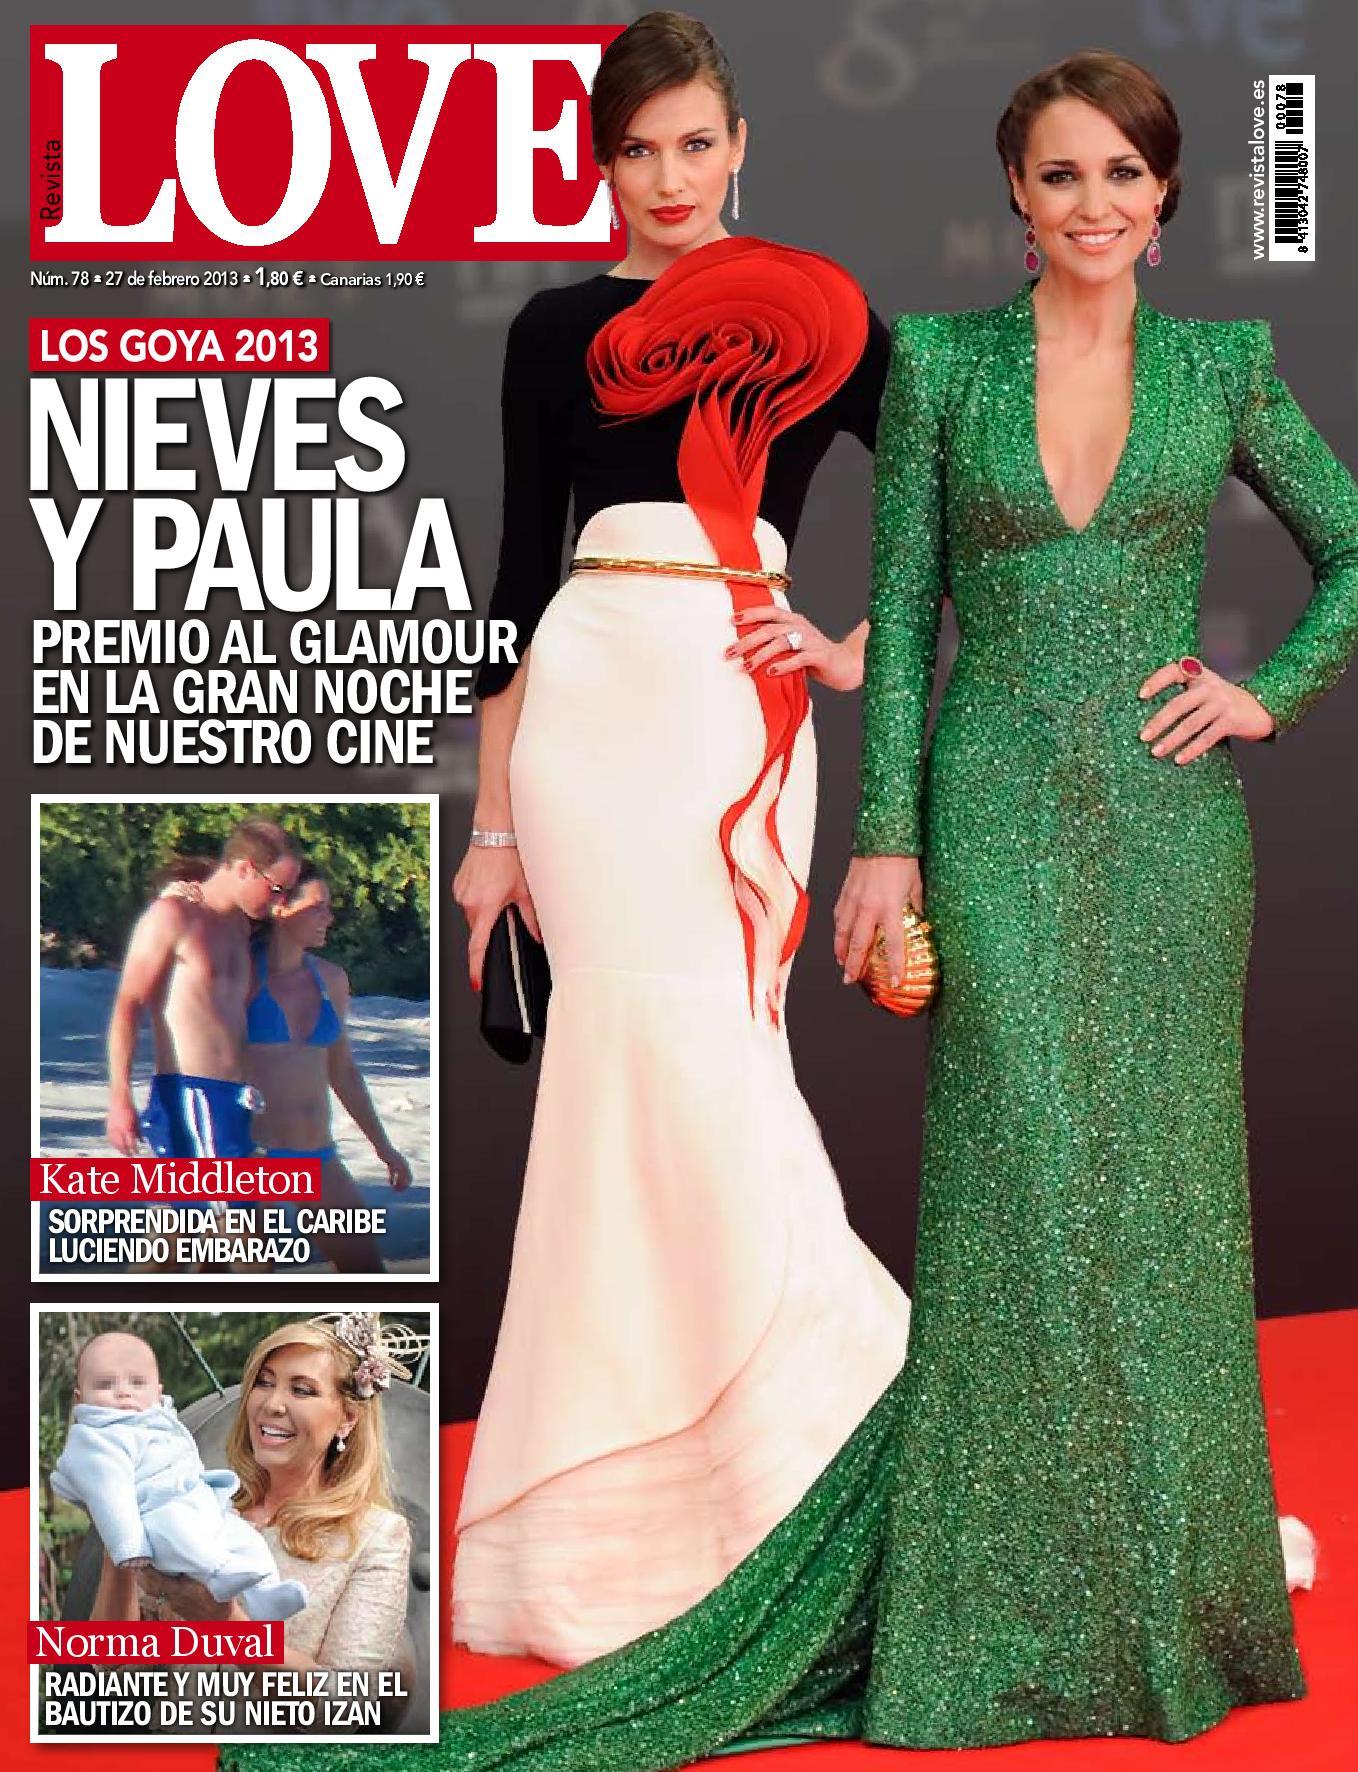 LOVE portada 19 de febrero 2013